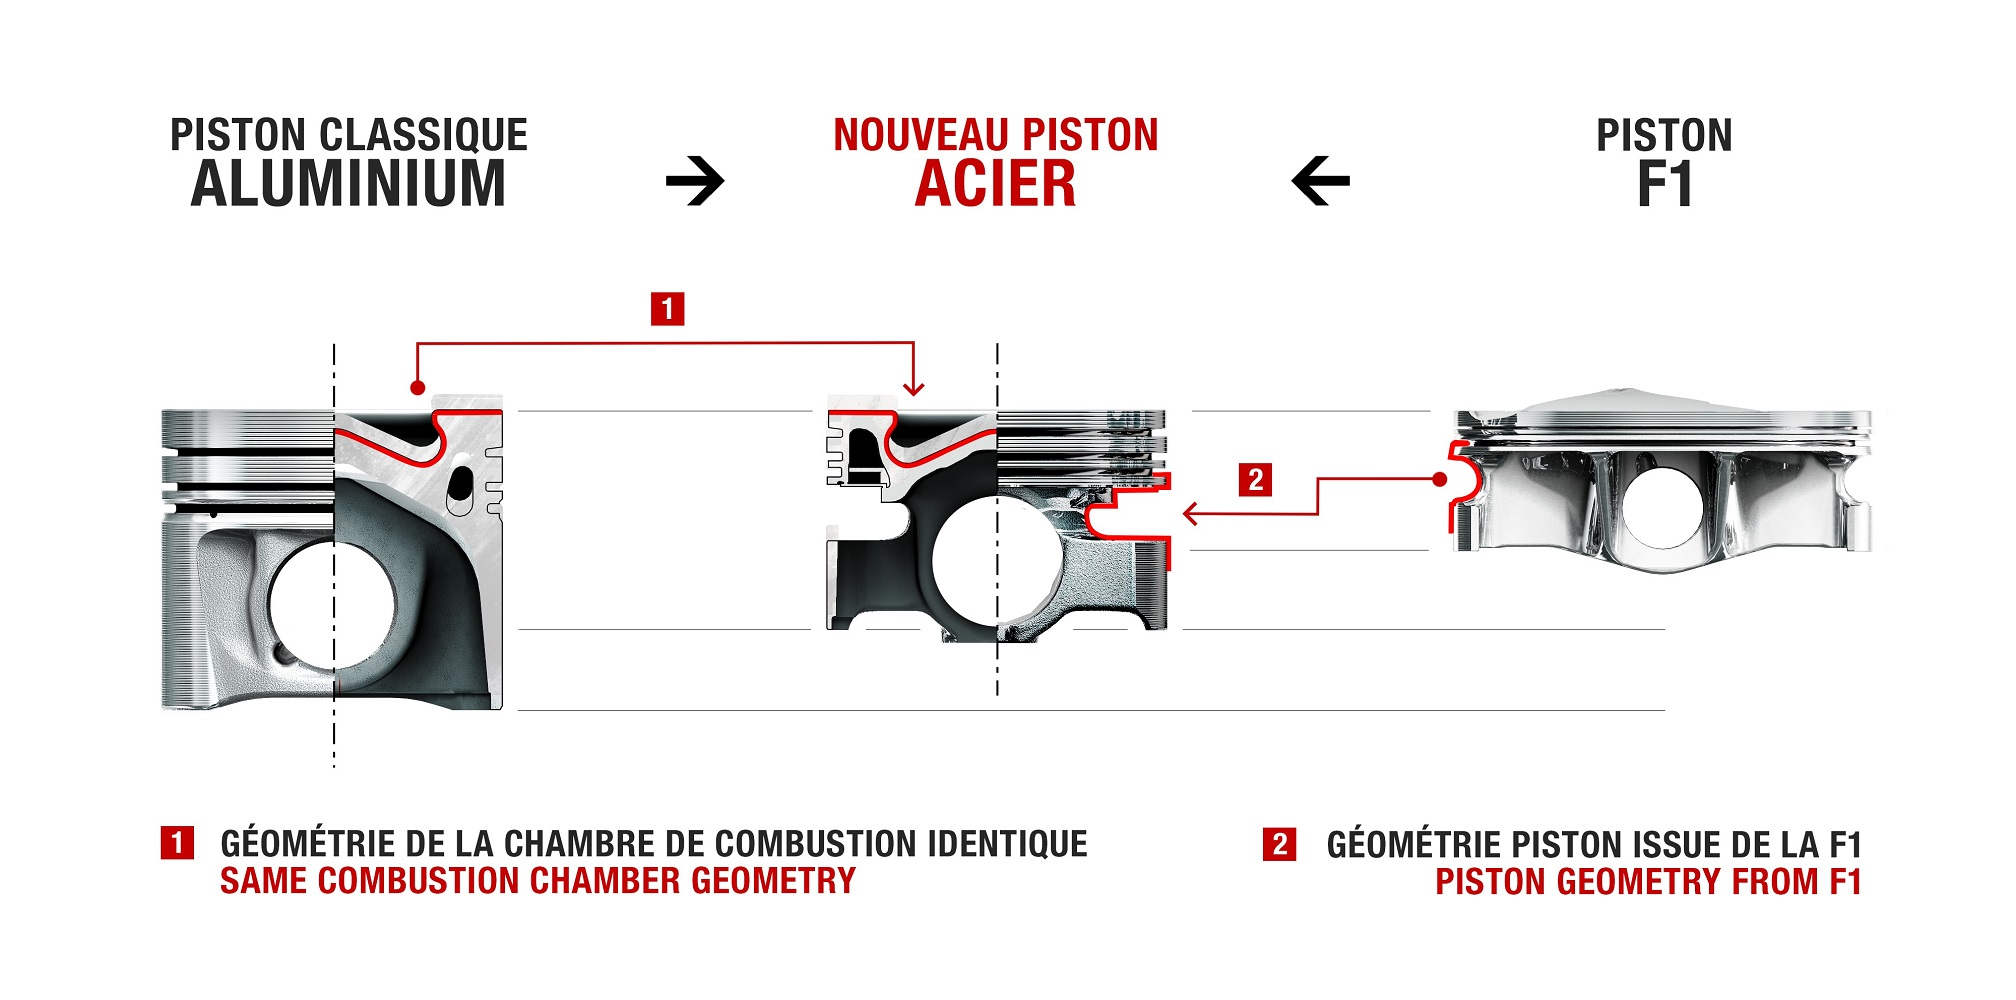 Renault steel piston design